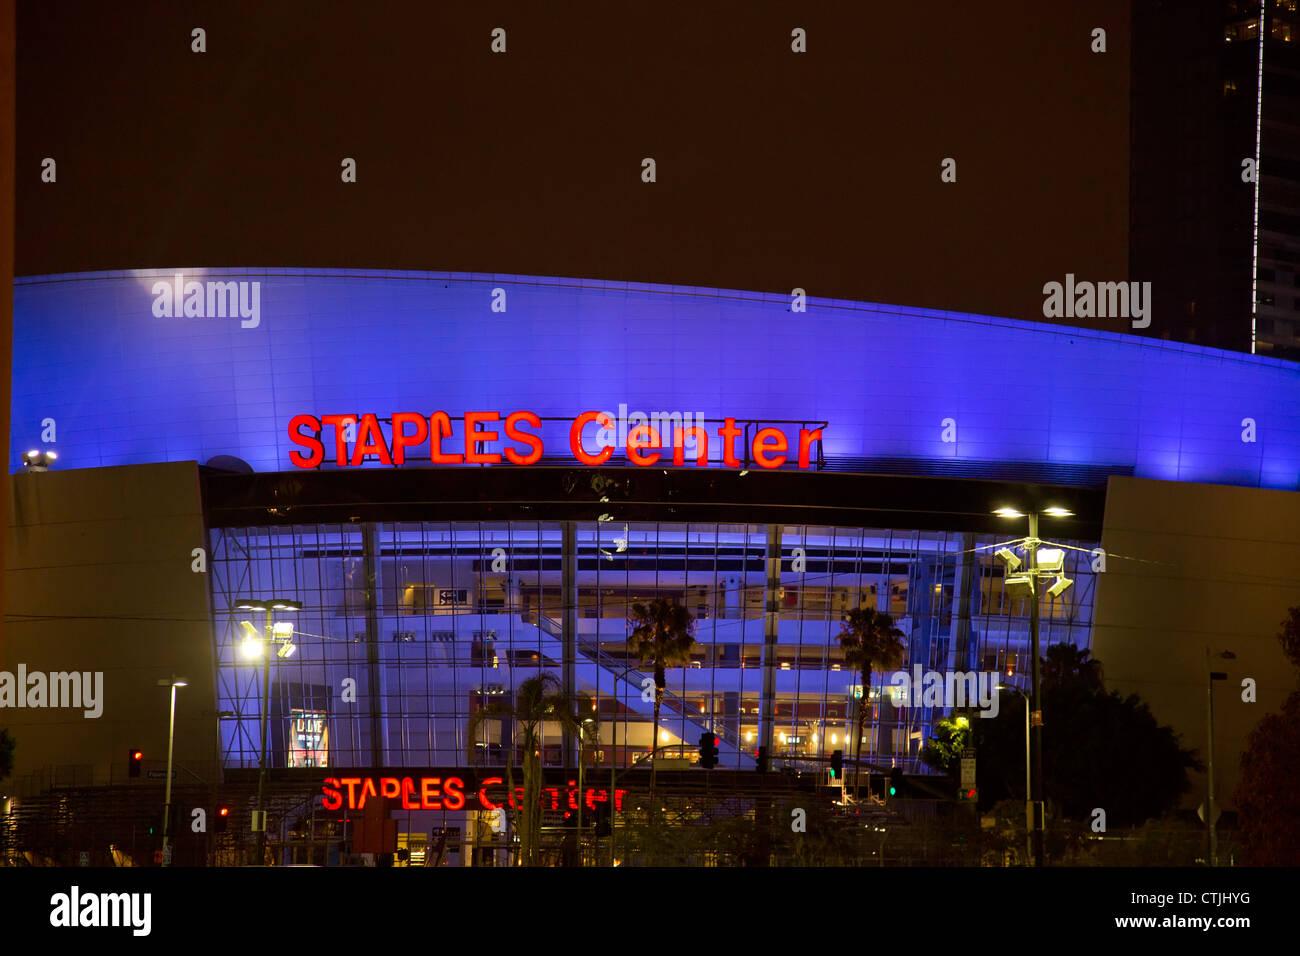 Los Angeles, California - The Staples Center. - Stock Image